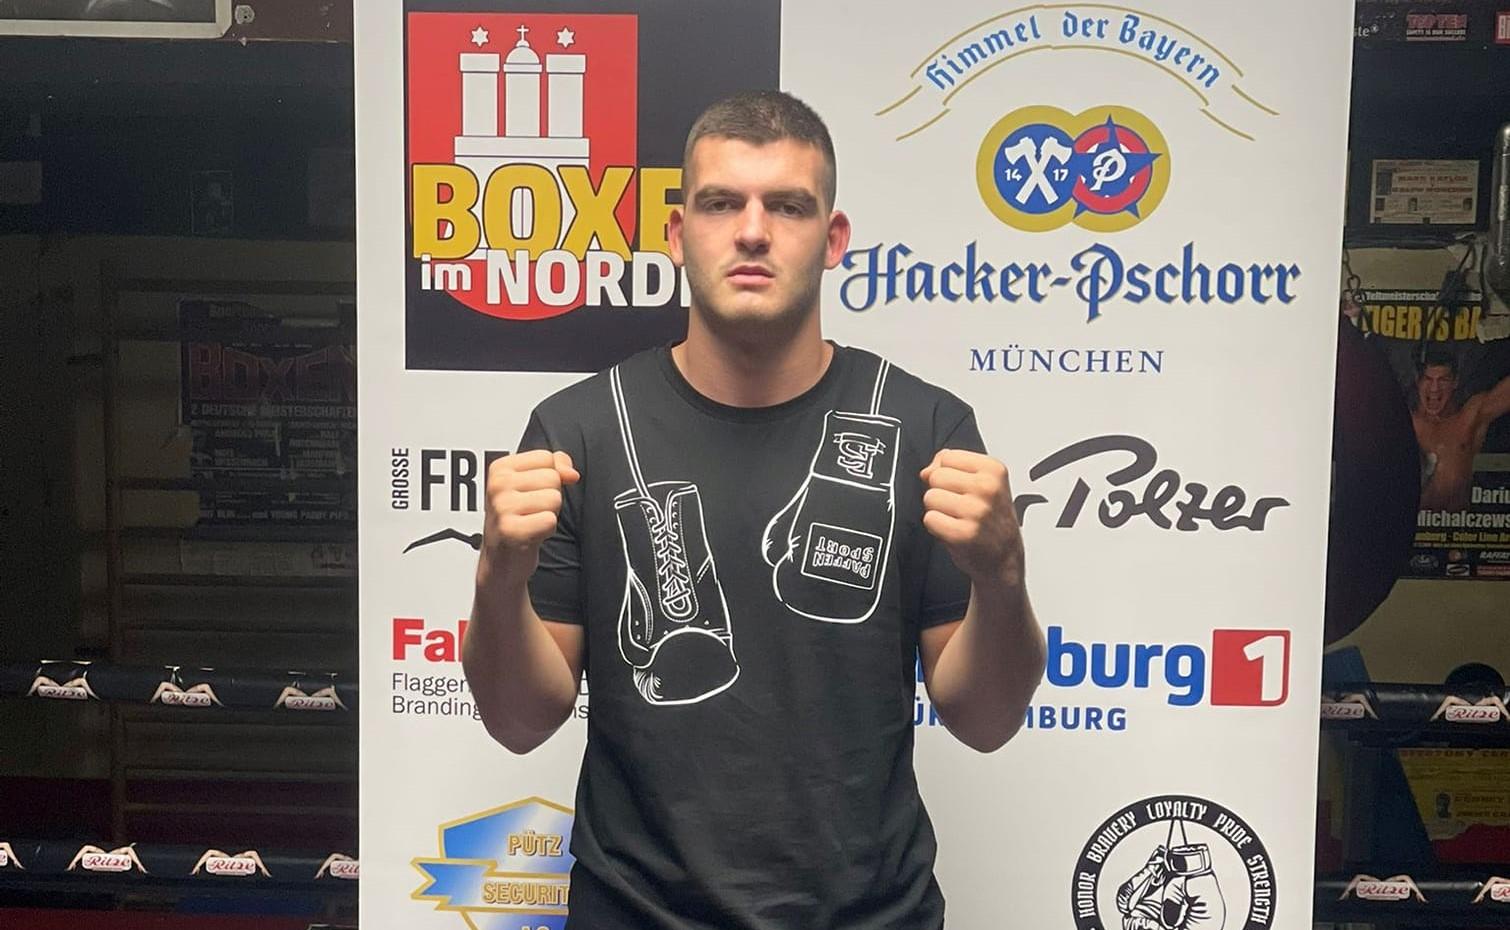 Пенчо Цветков с профи мач на боксова гала в Хамбург днес